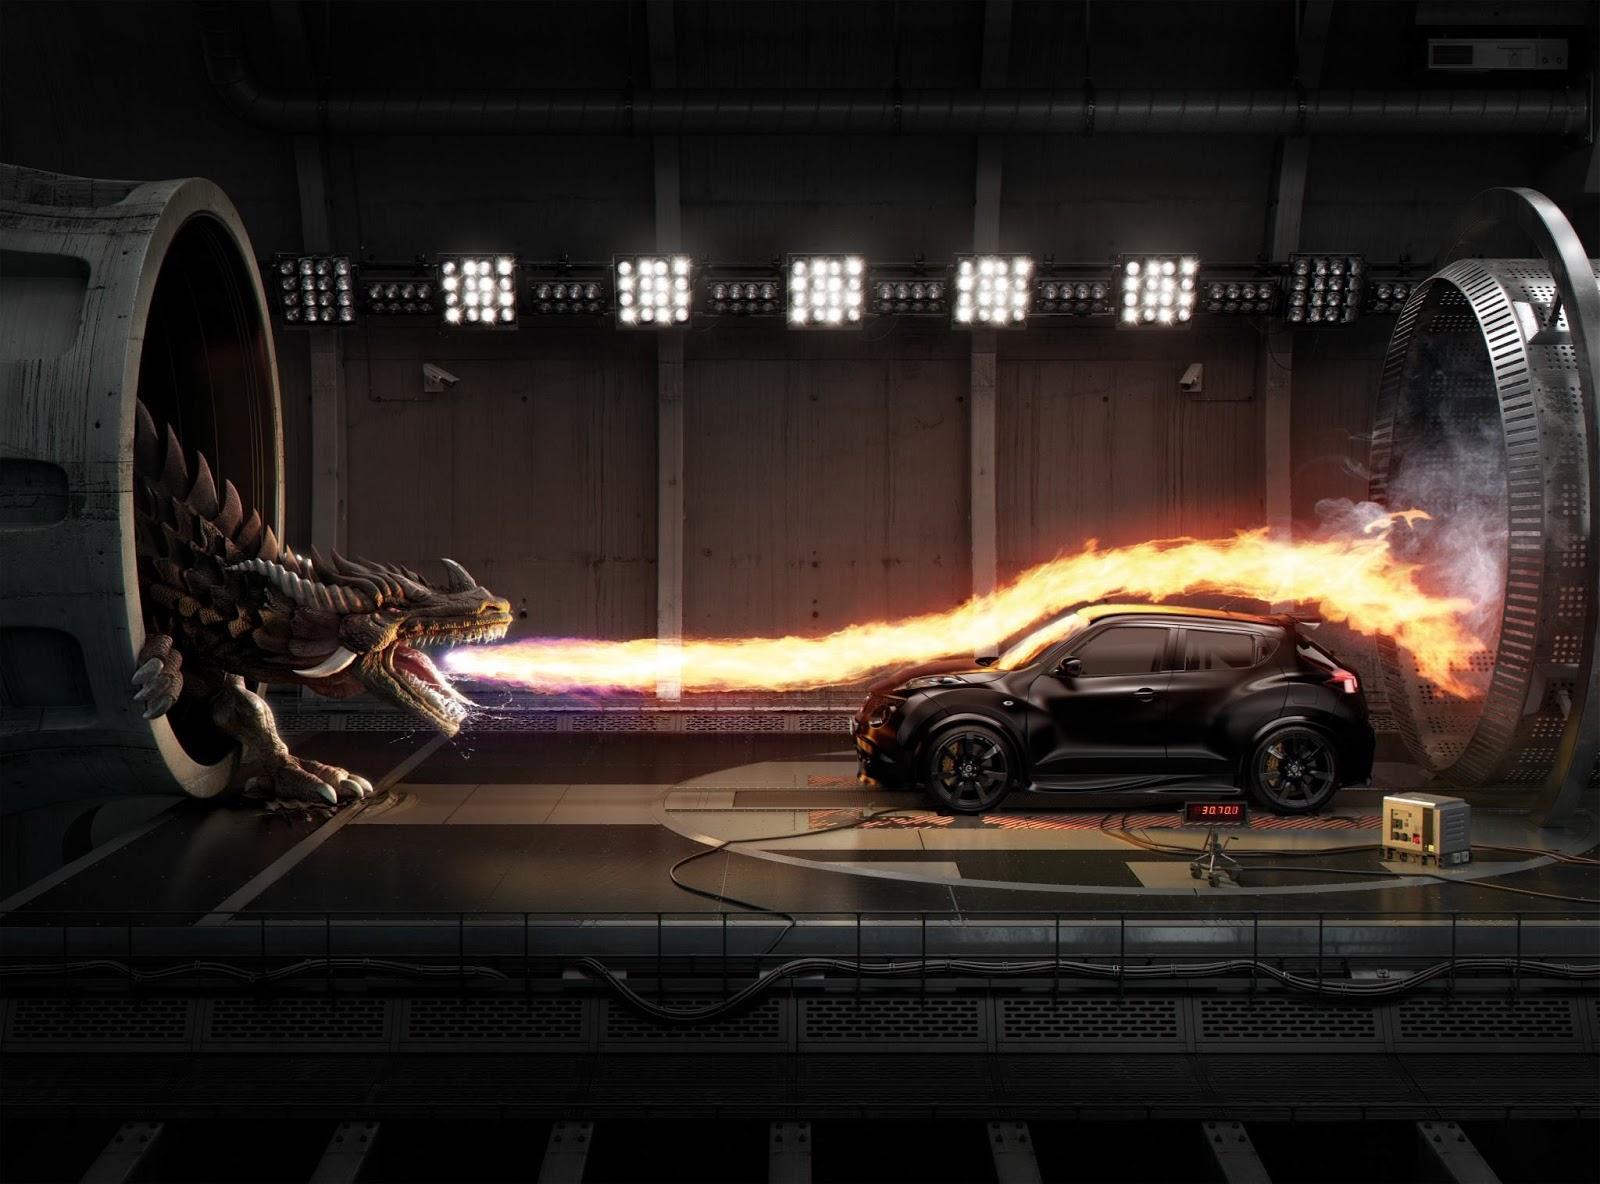 Fantasy Dragon Dragons Car Fire Wallpaper X - Cool cars on fire